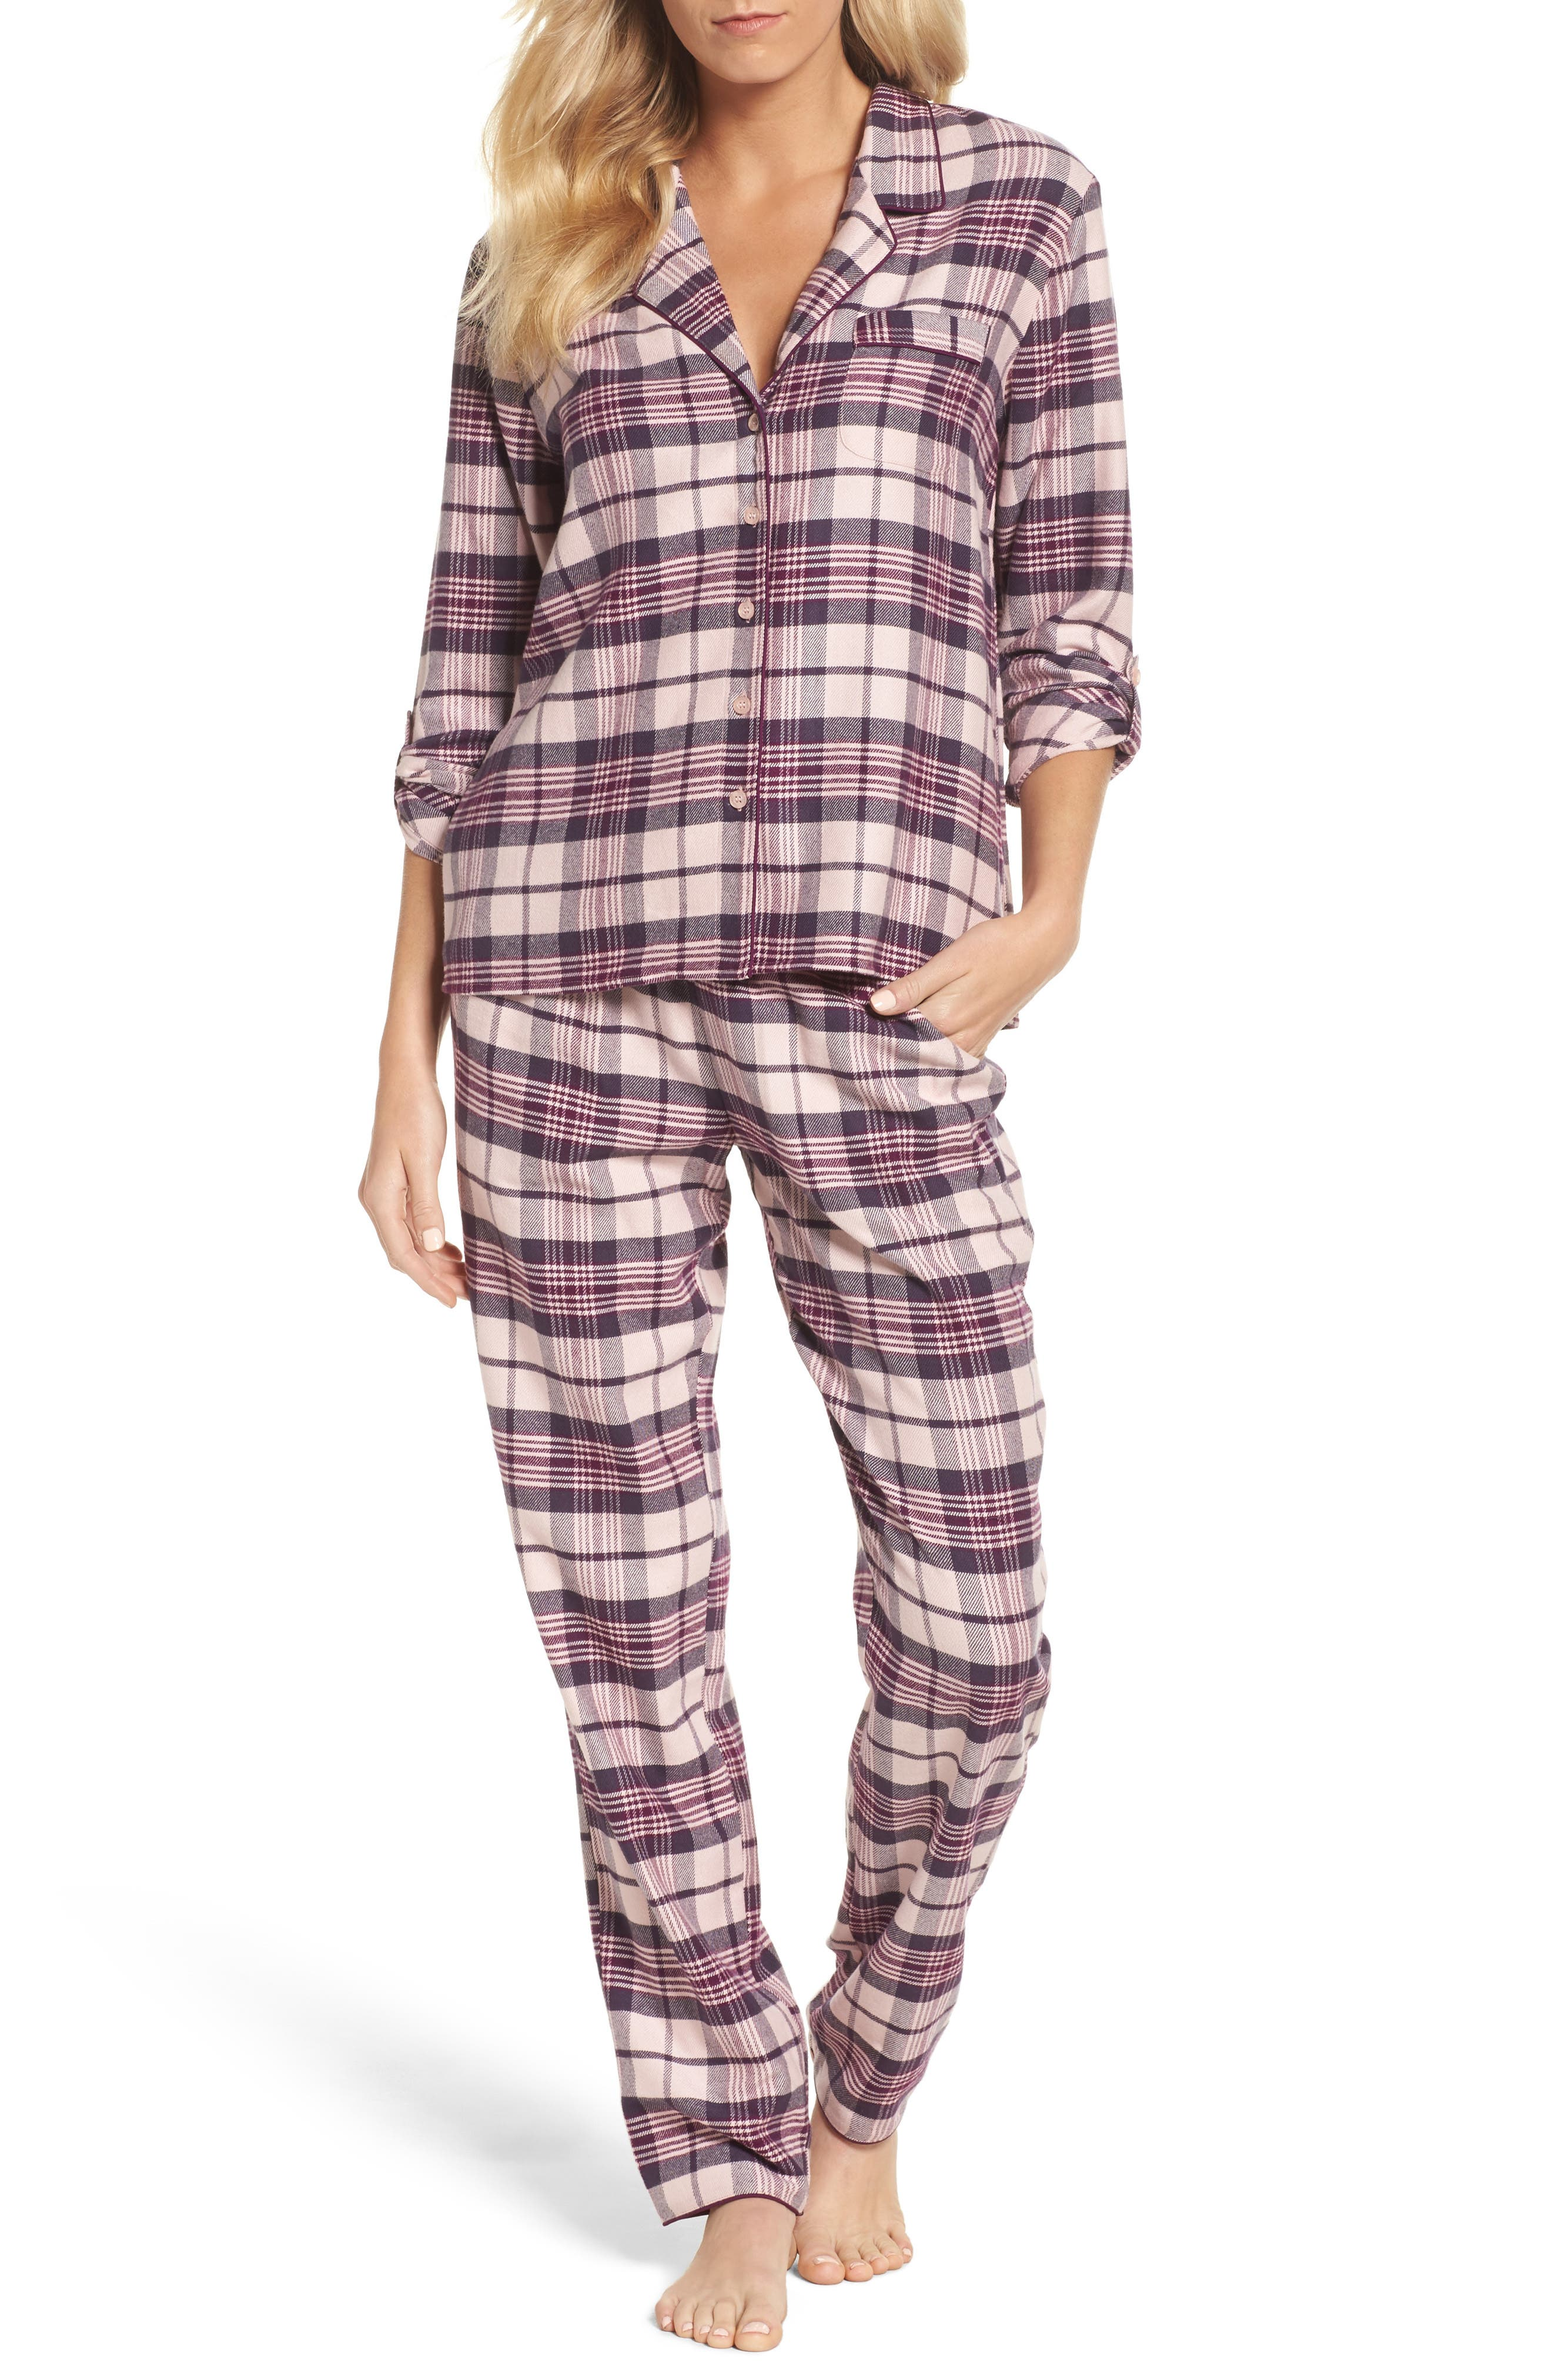 Main Image - Nordstrom Lingerie Starlight Flannel Pajamas